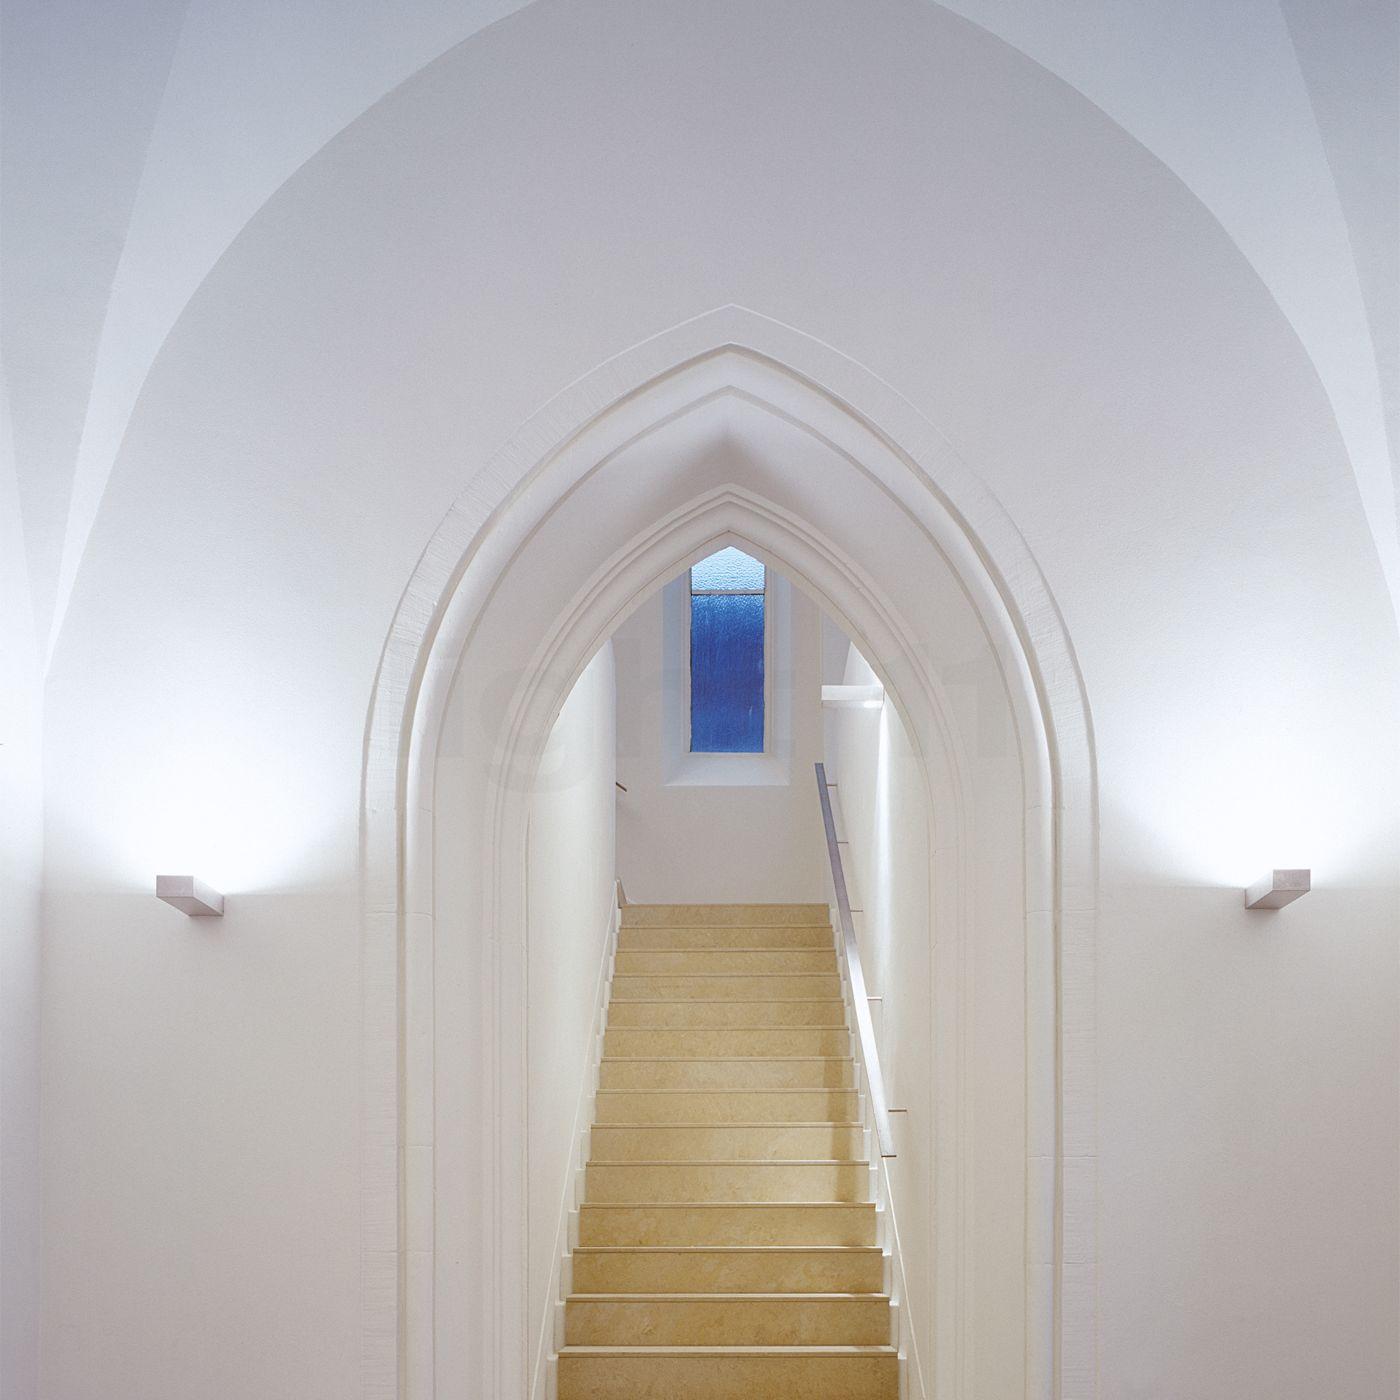 Steng Licht Ag steng licht half big brigg led wall light floor uplighters